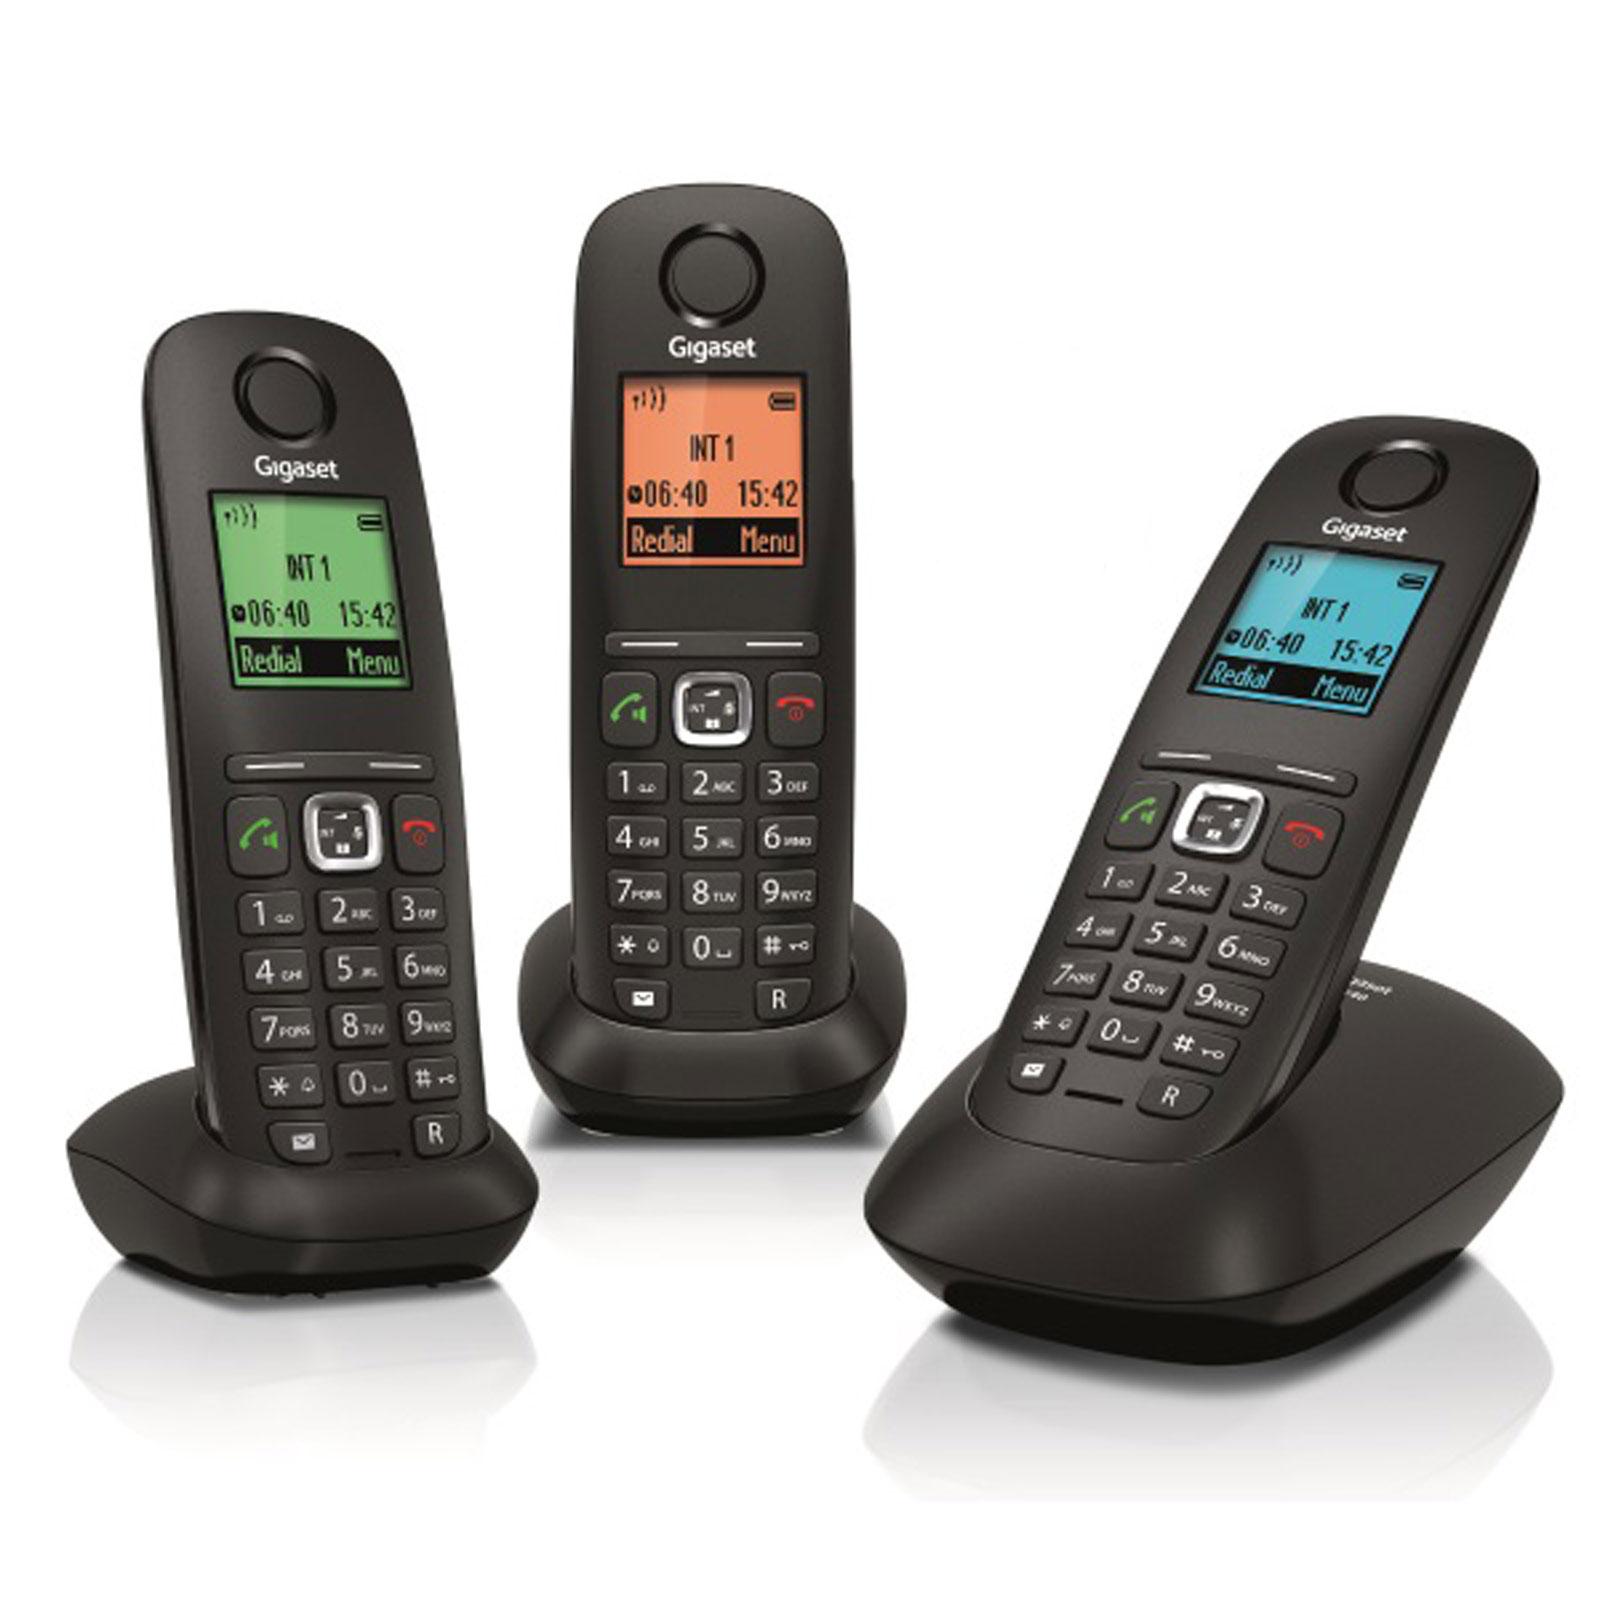 gigaset a540 trio noir t l phone sans fil gigaset sur. Black Bedroom Furniture Sets. Home Design Ideas